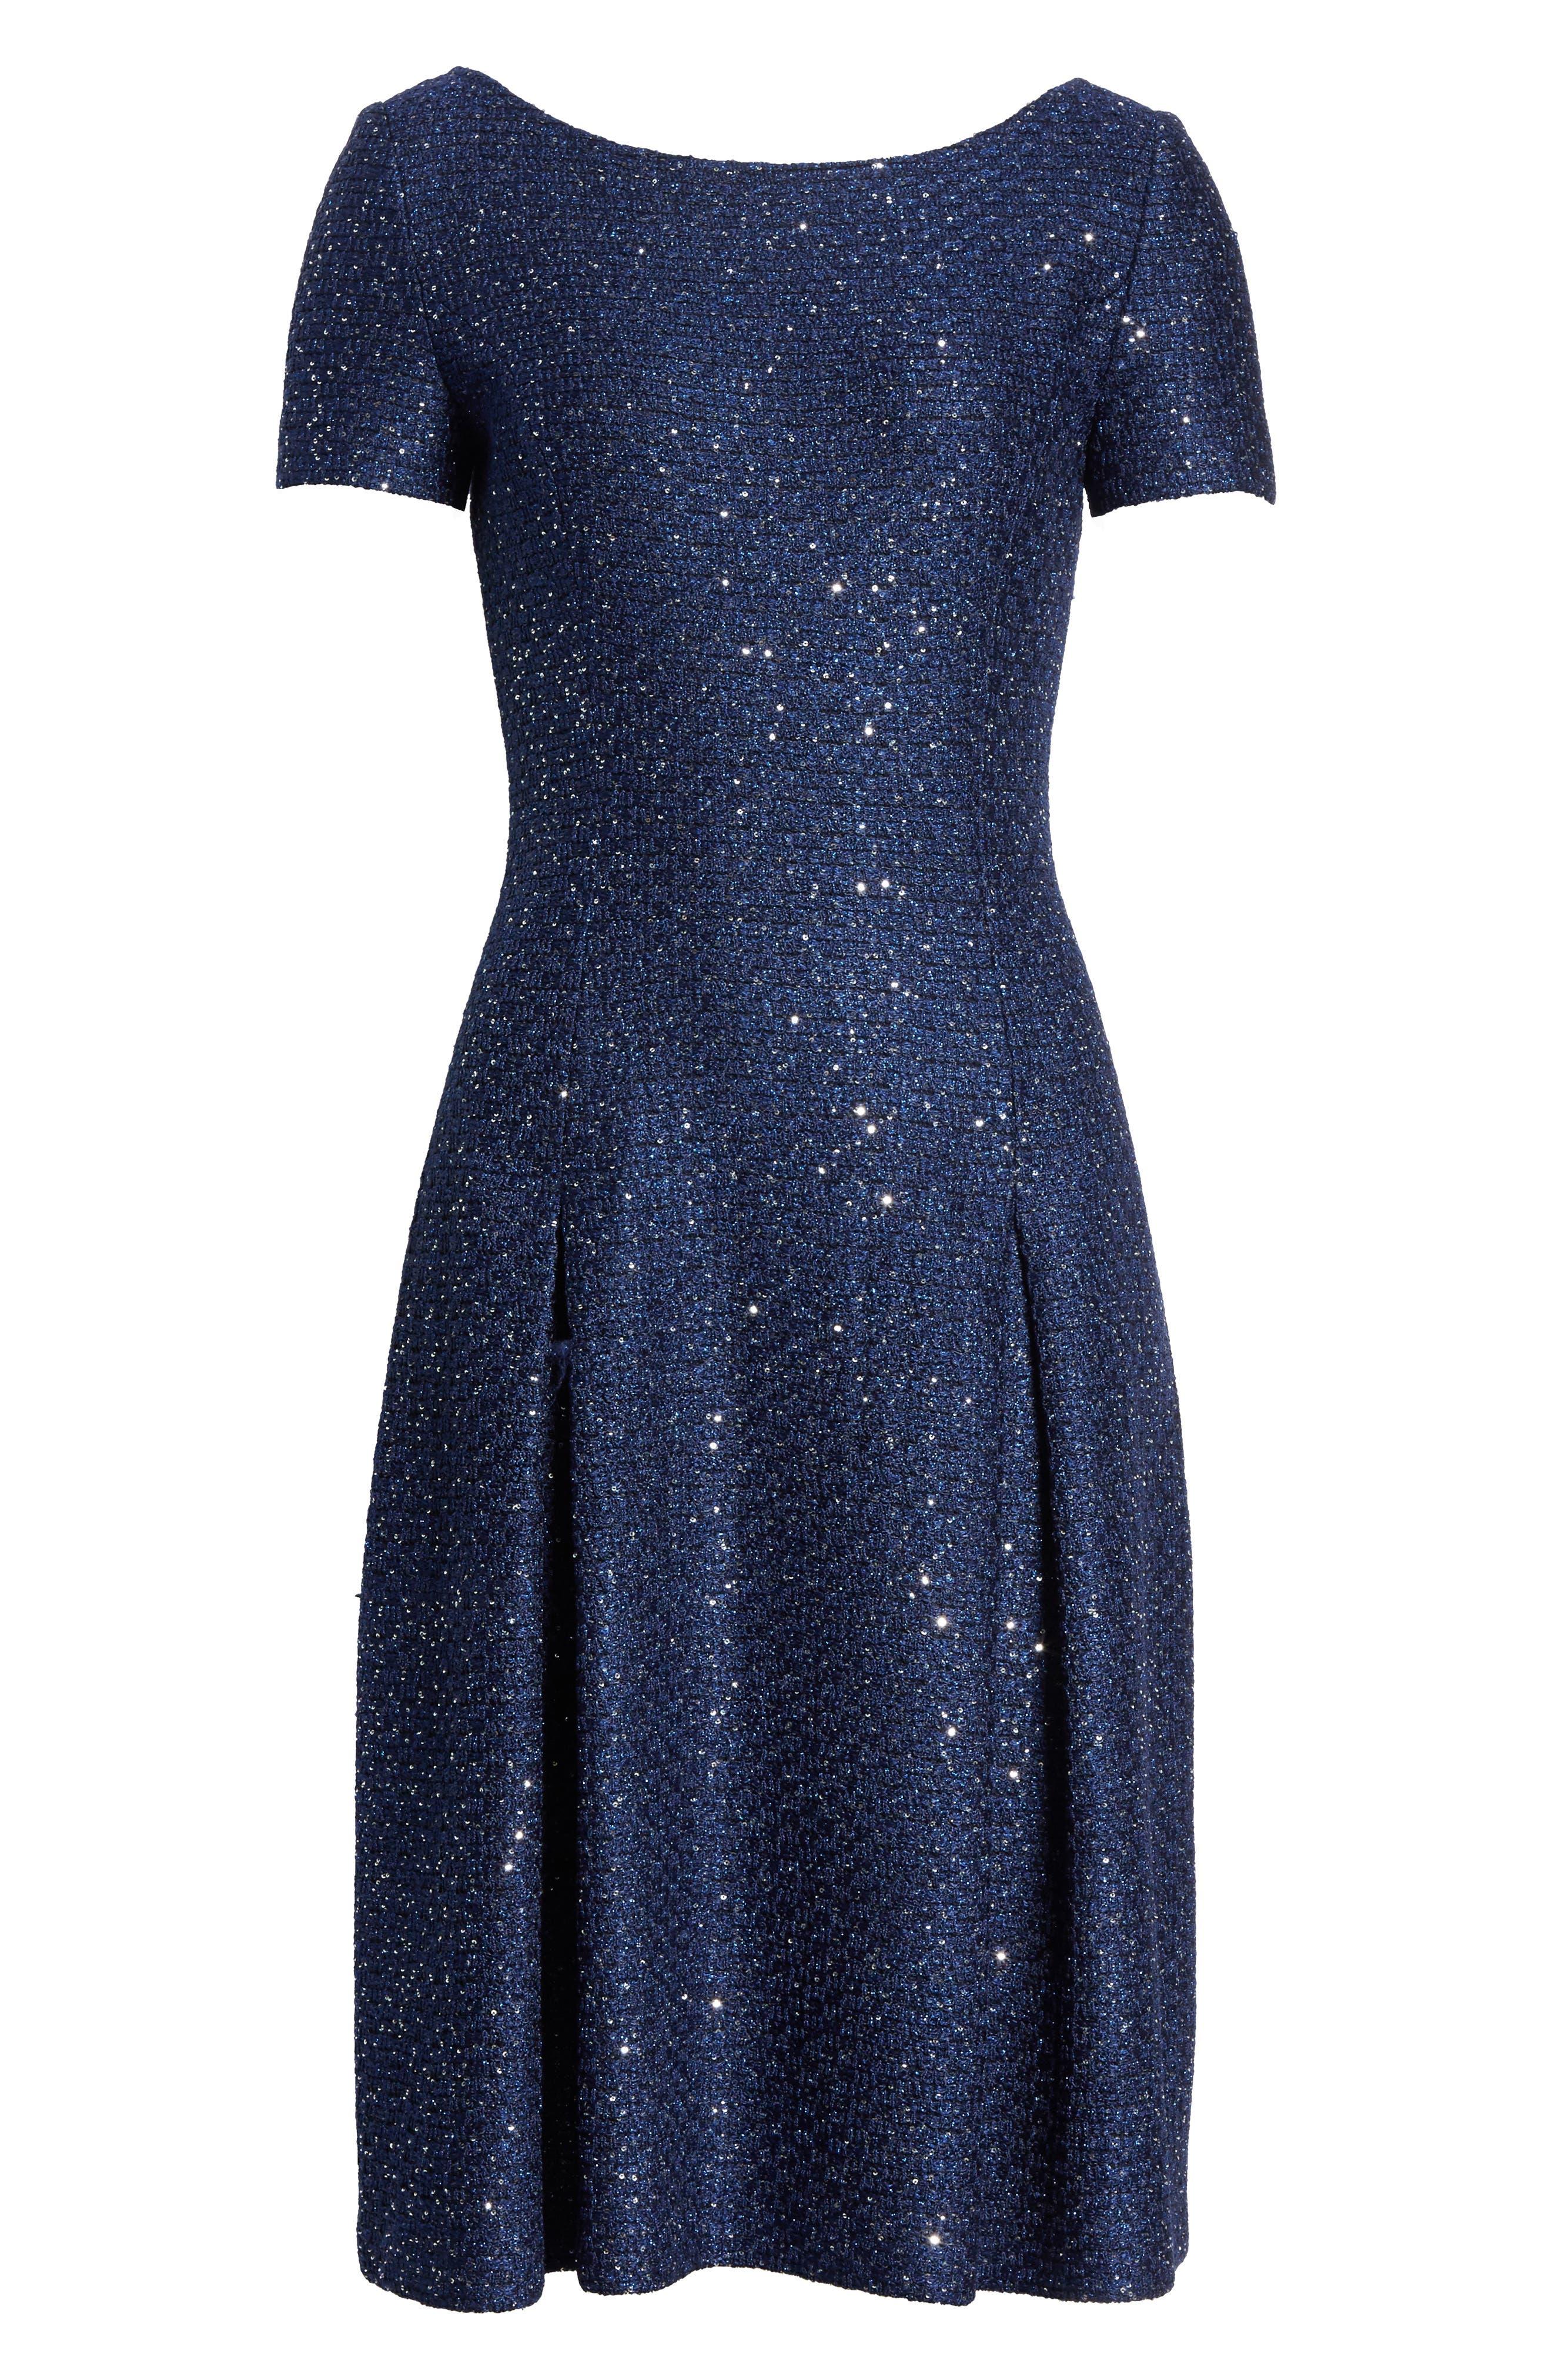 Sparkle Sequin Knit Fit & Flare Dress,                             Alternate thumbnail 7, color,                             Navy Multi